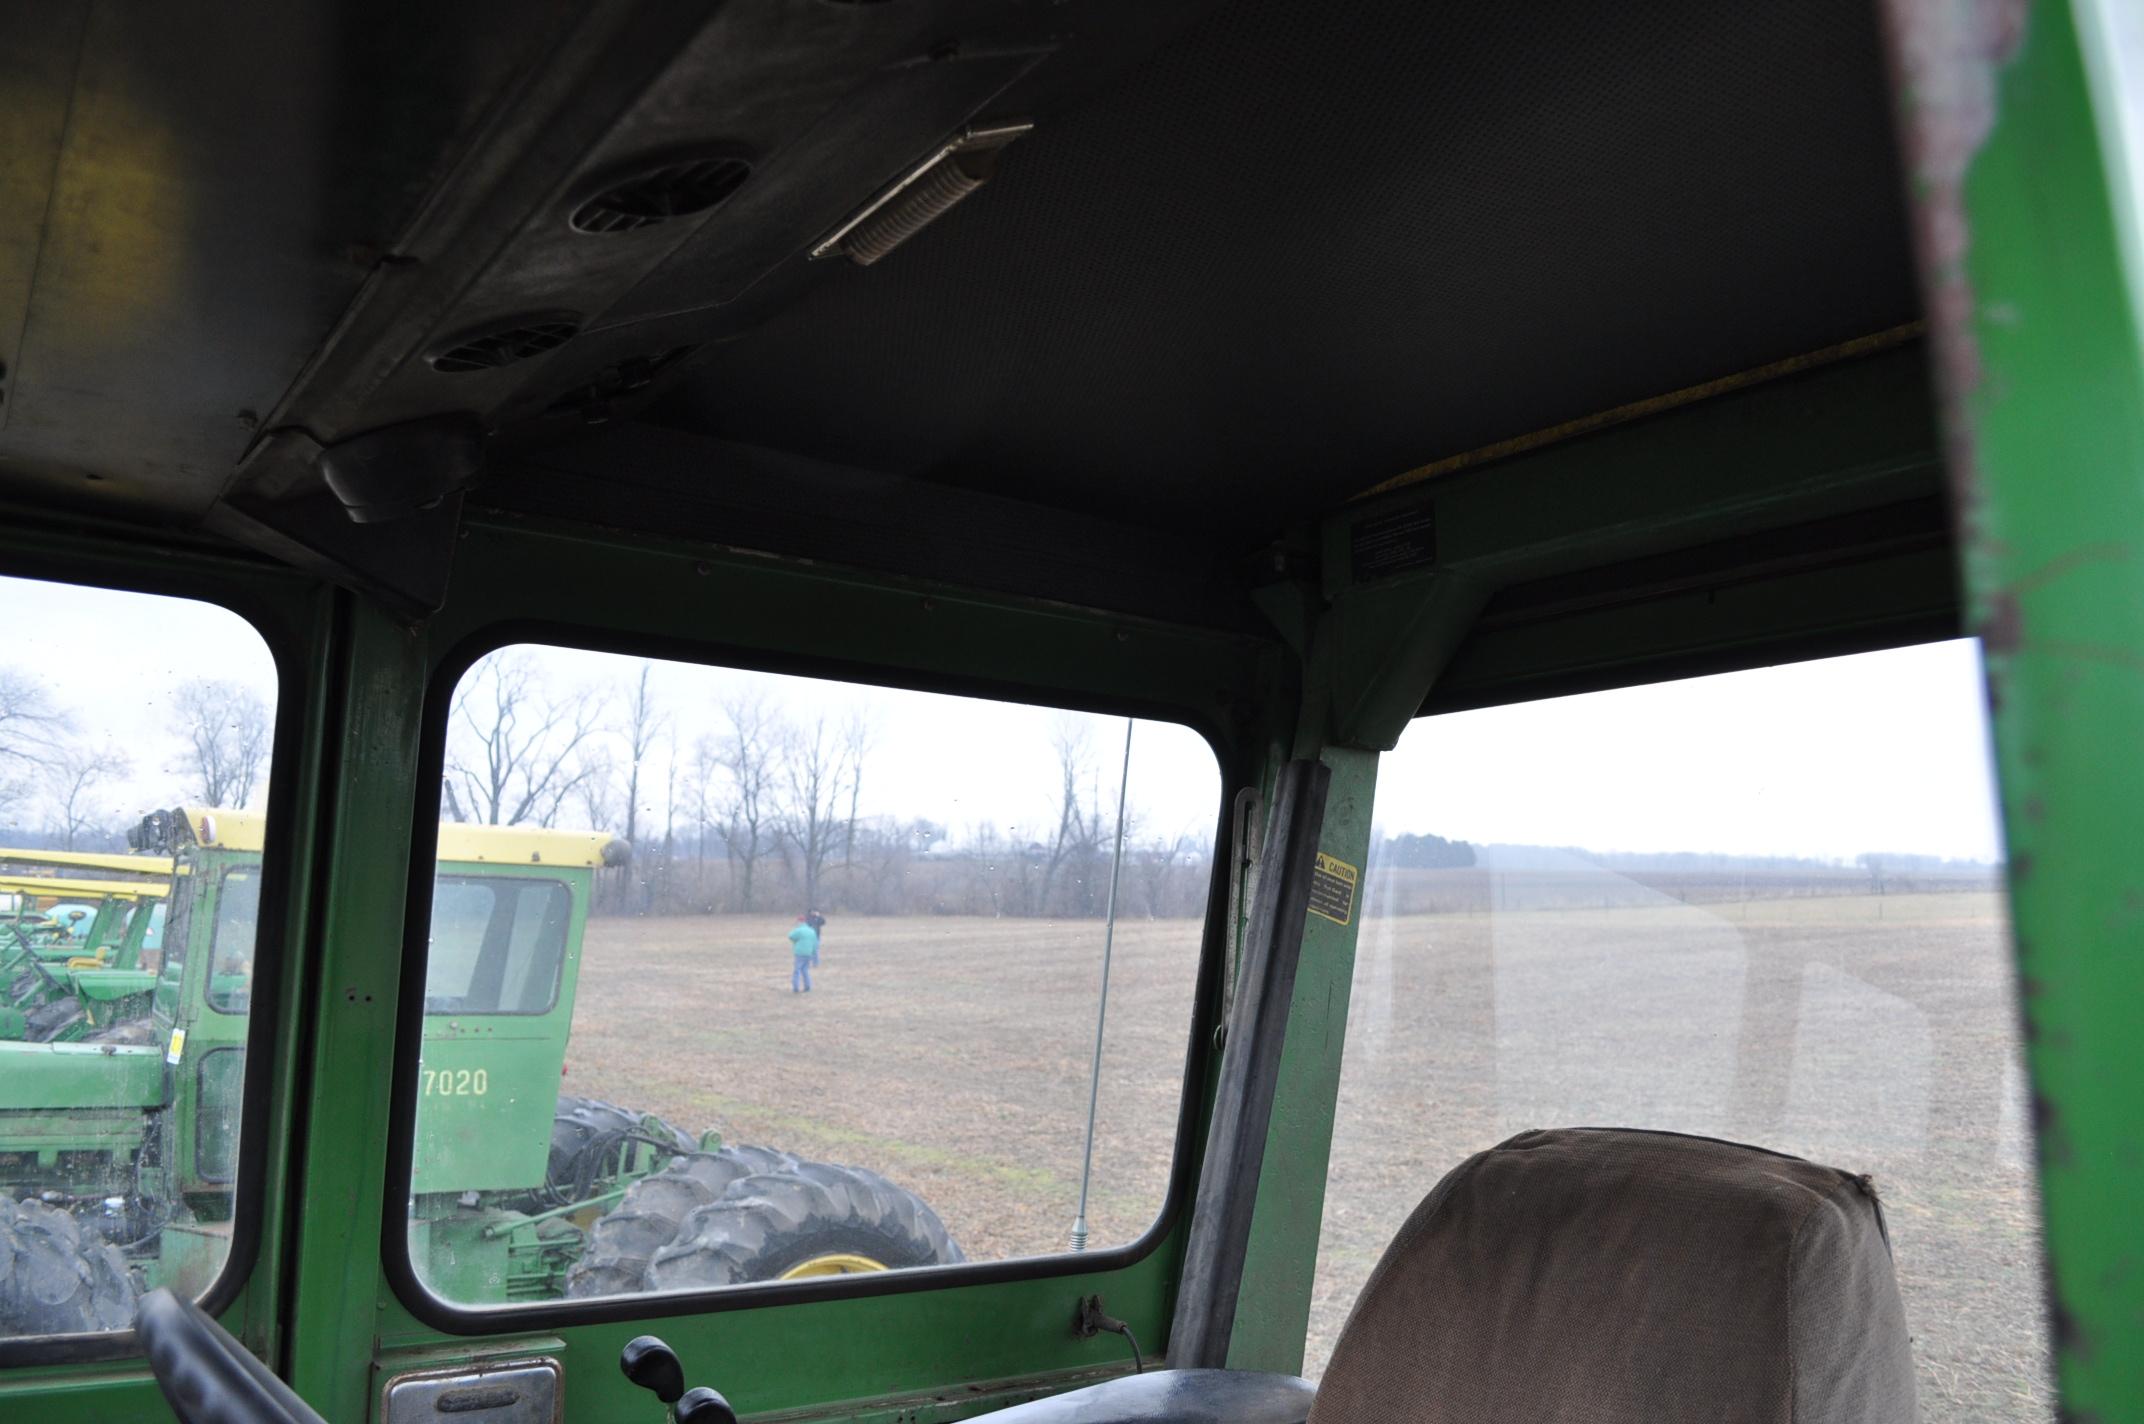 John Deere 7520 tractor, 4WD, diesel, 18.4-34 duals, original fenders, CHA, cab interior kit, 3 - Image 15 of 24